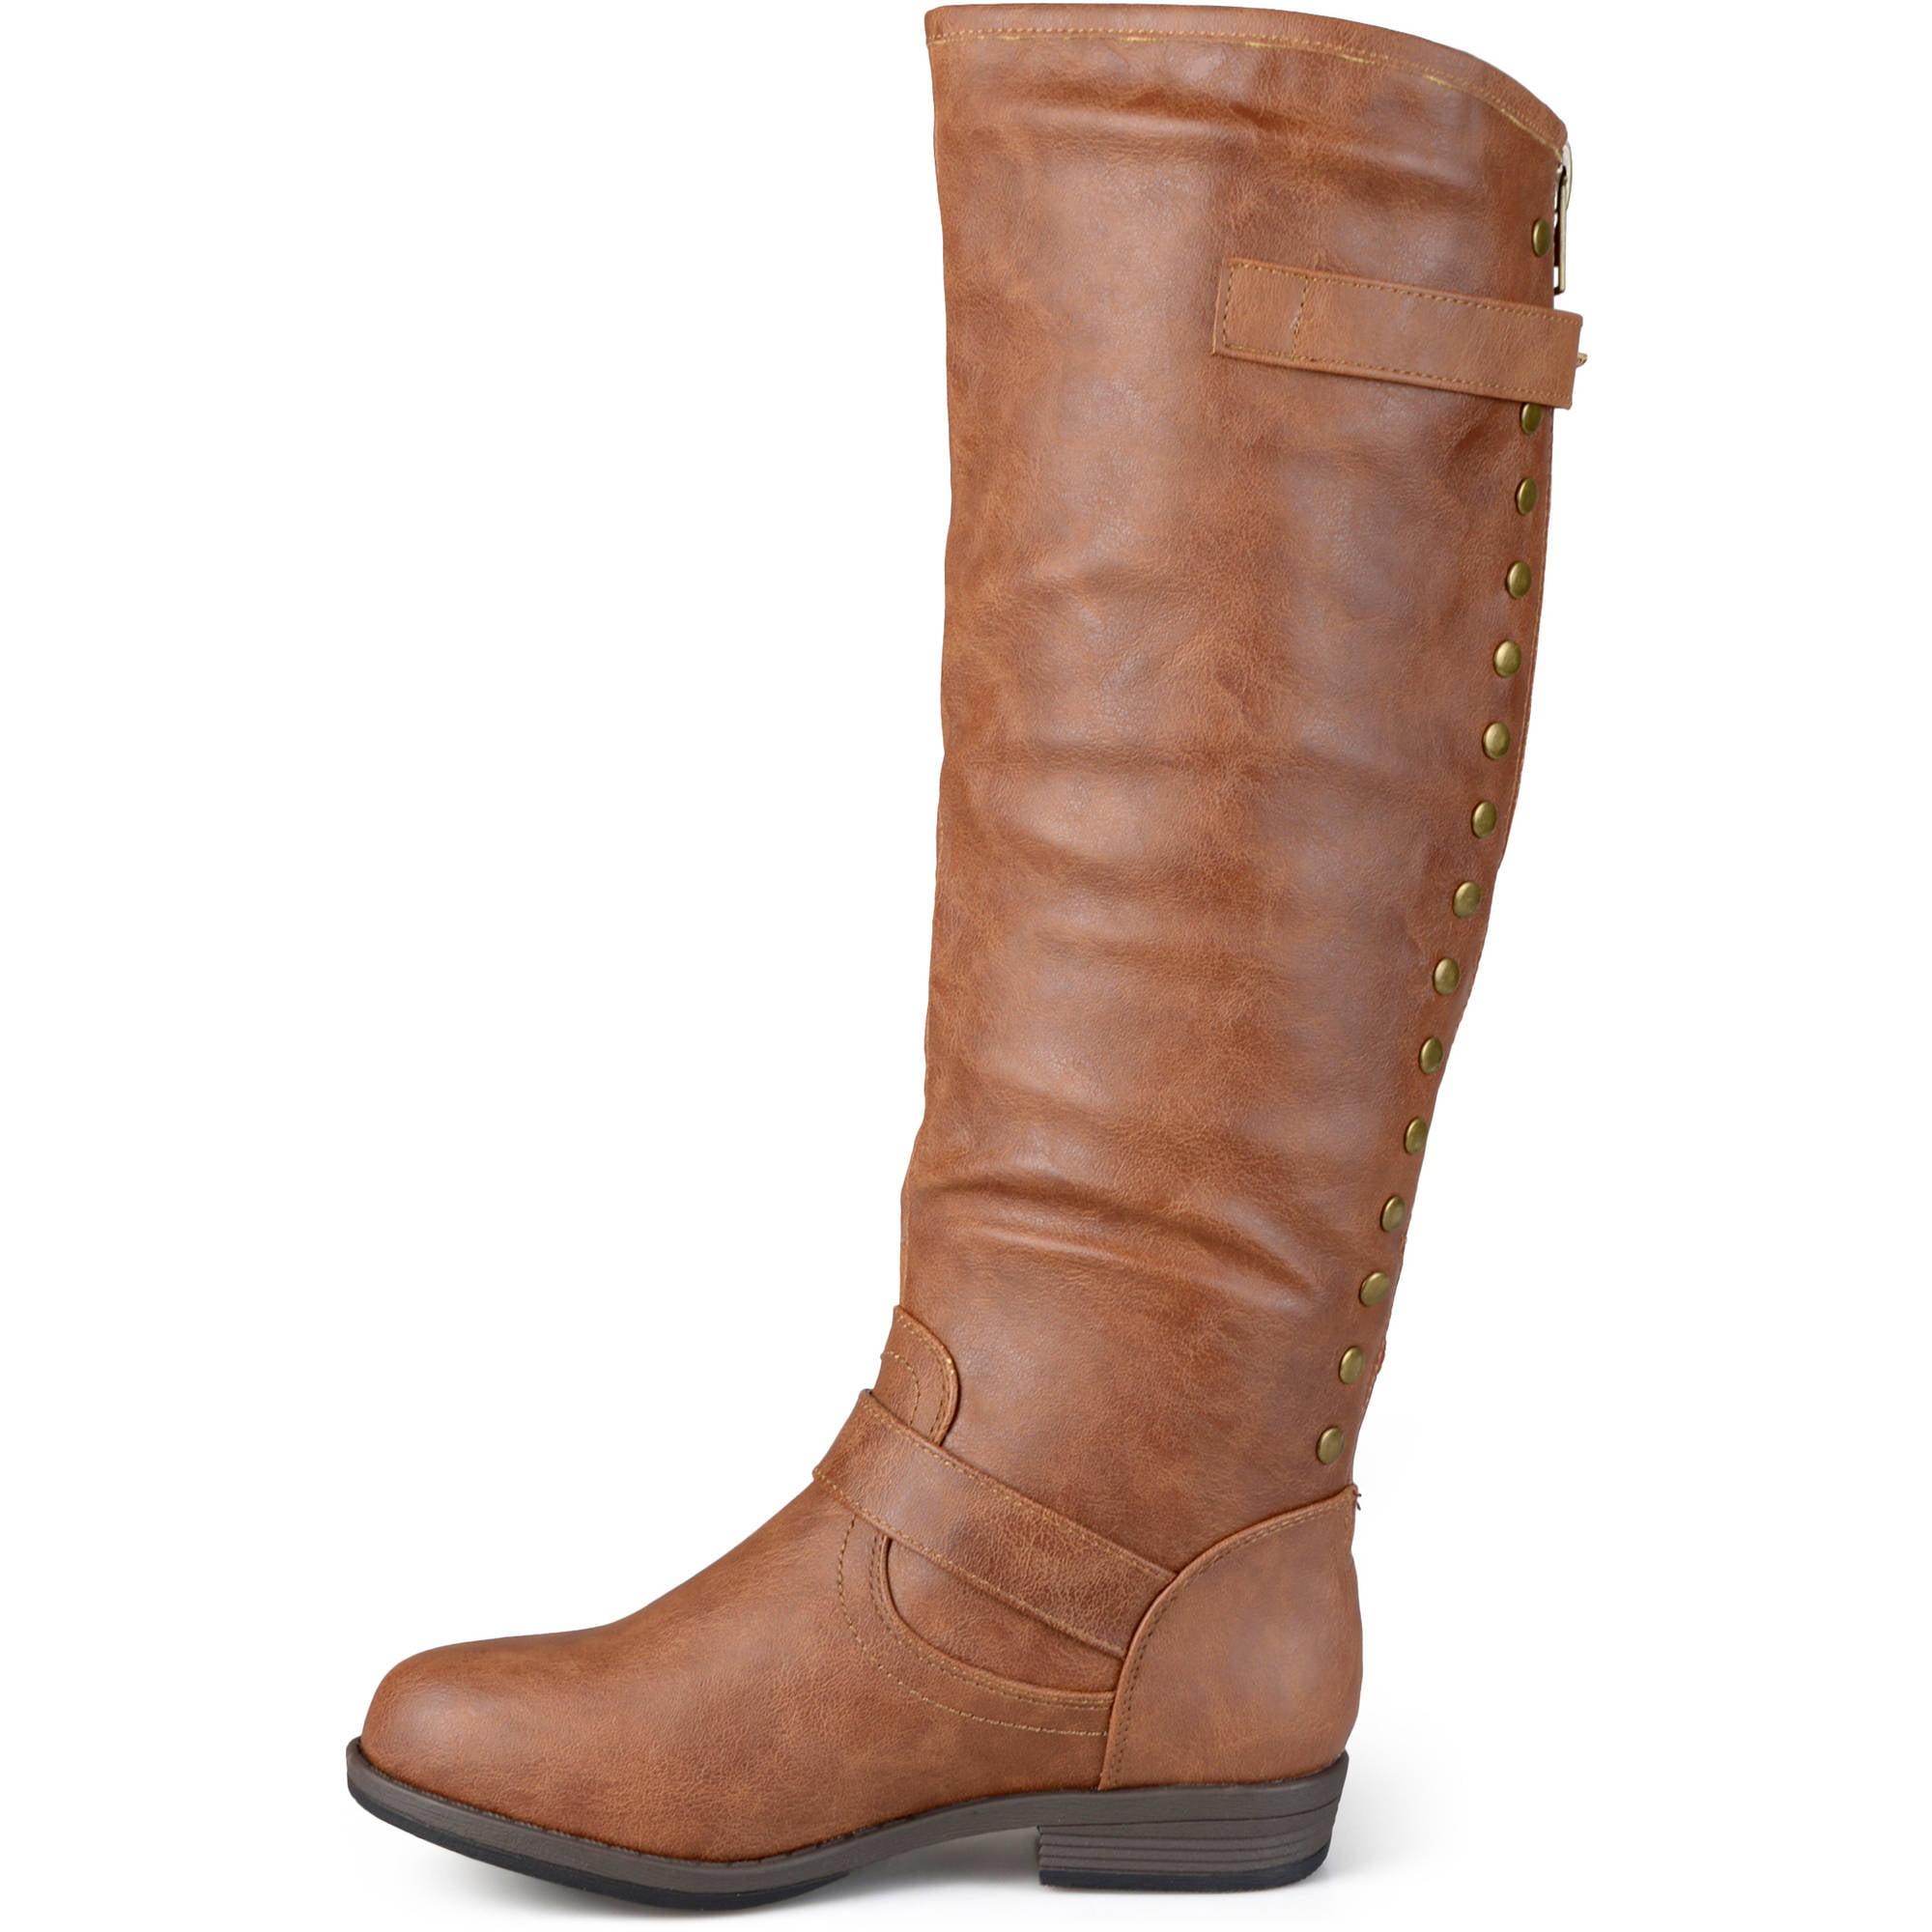 Brinley Co. Women's Knee-High Studded Riding Boot